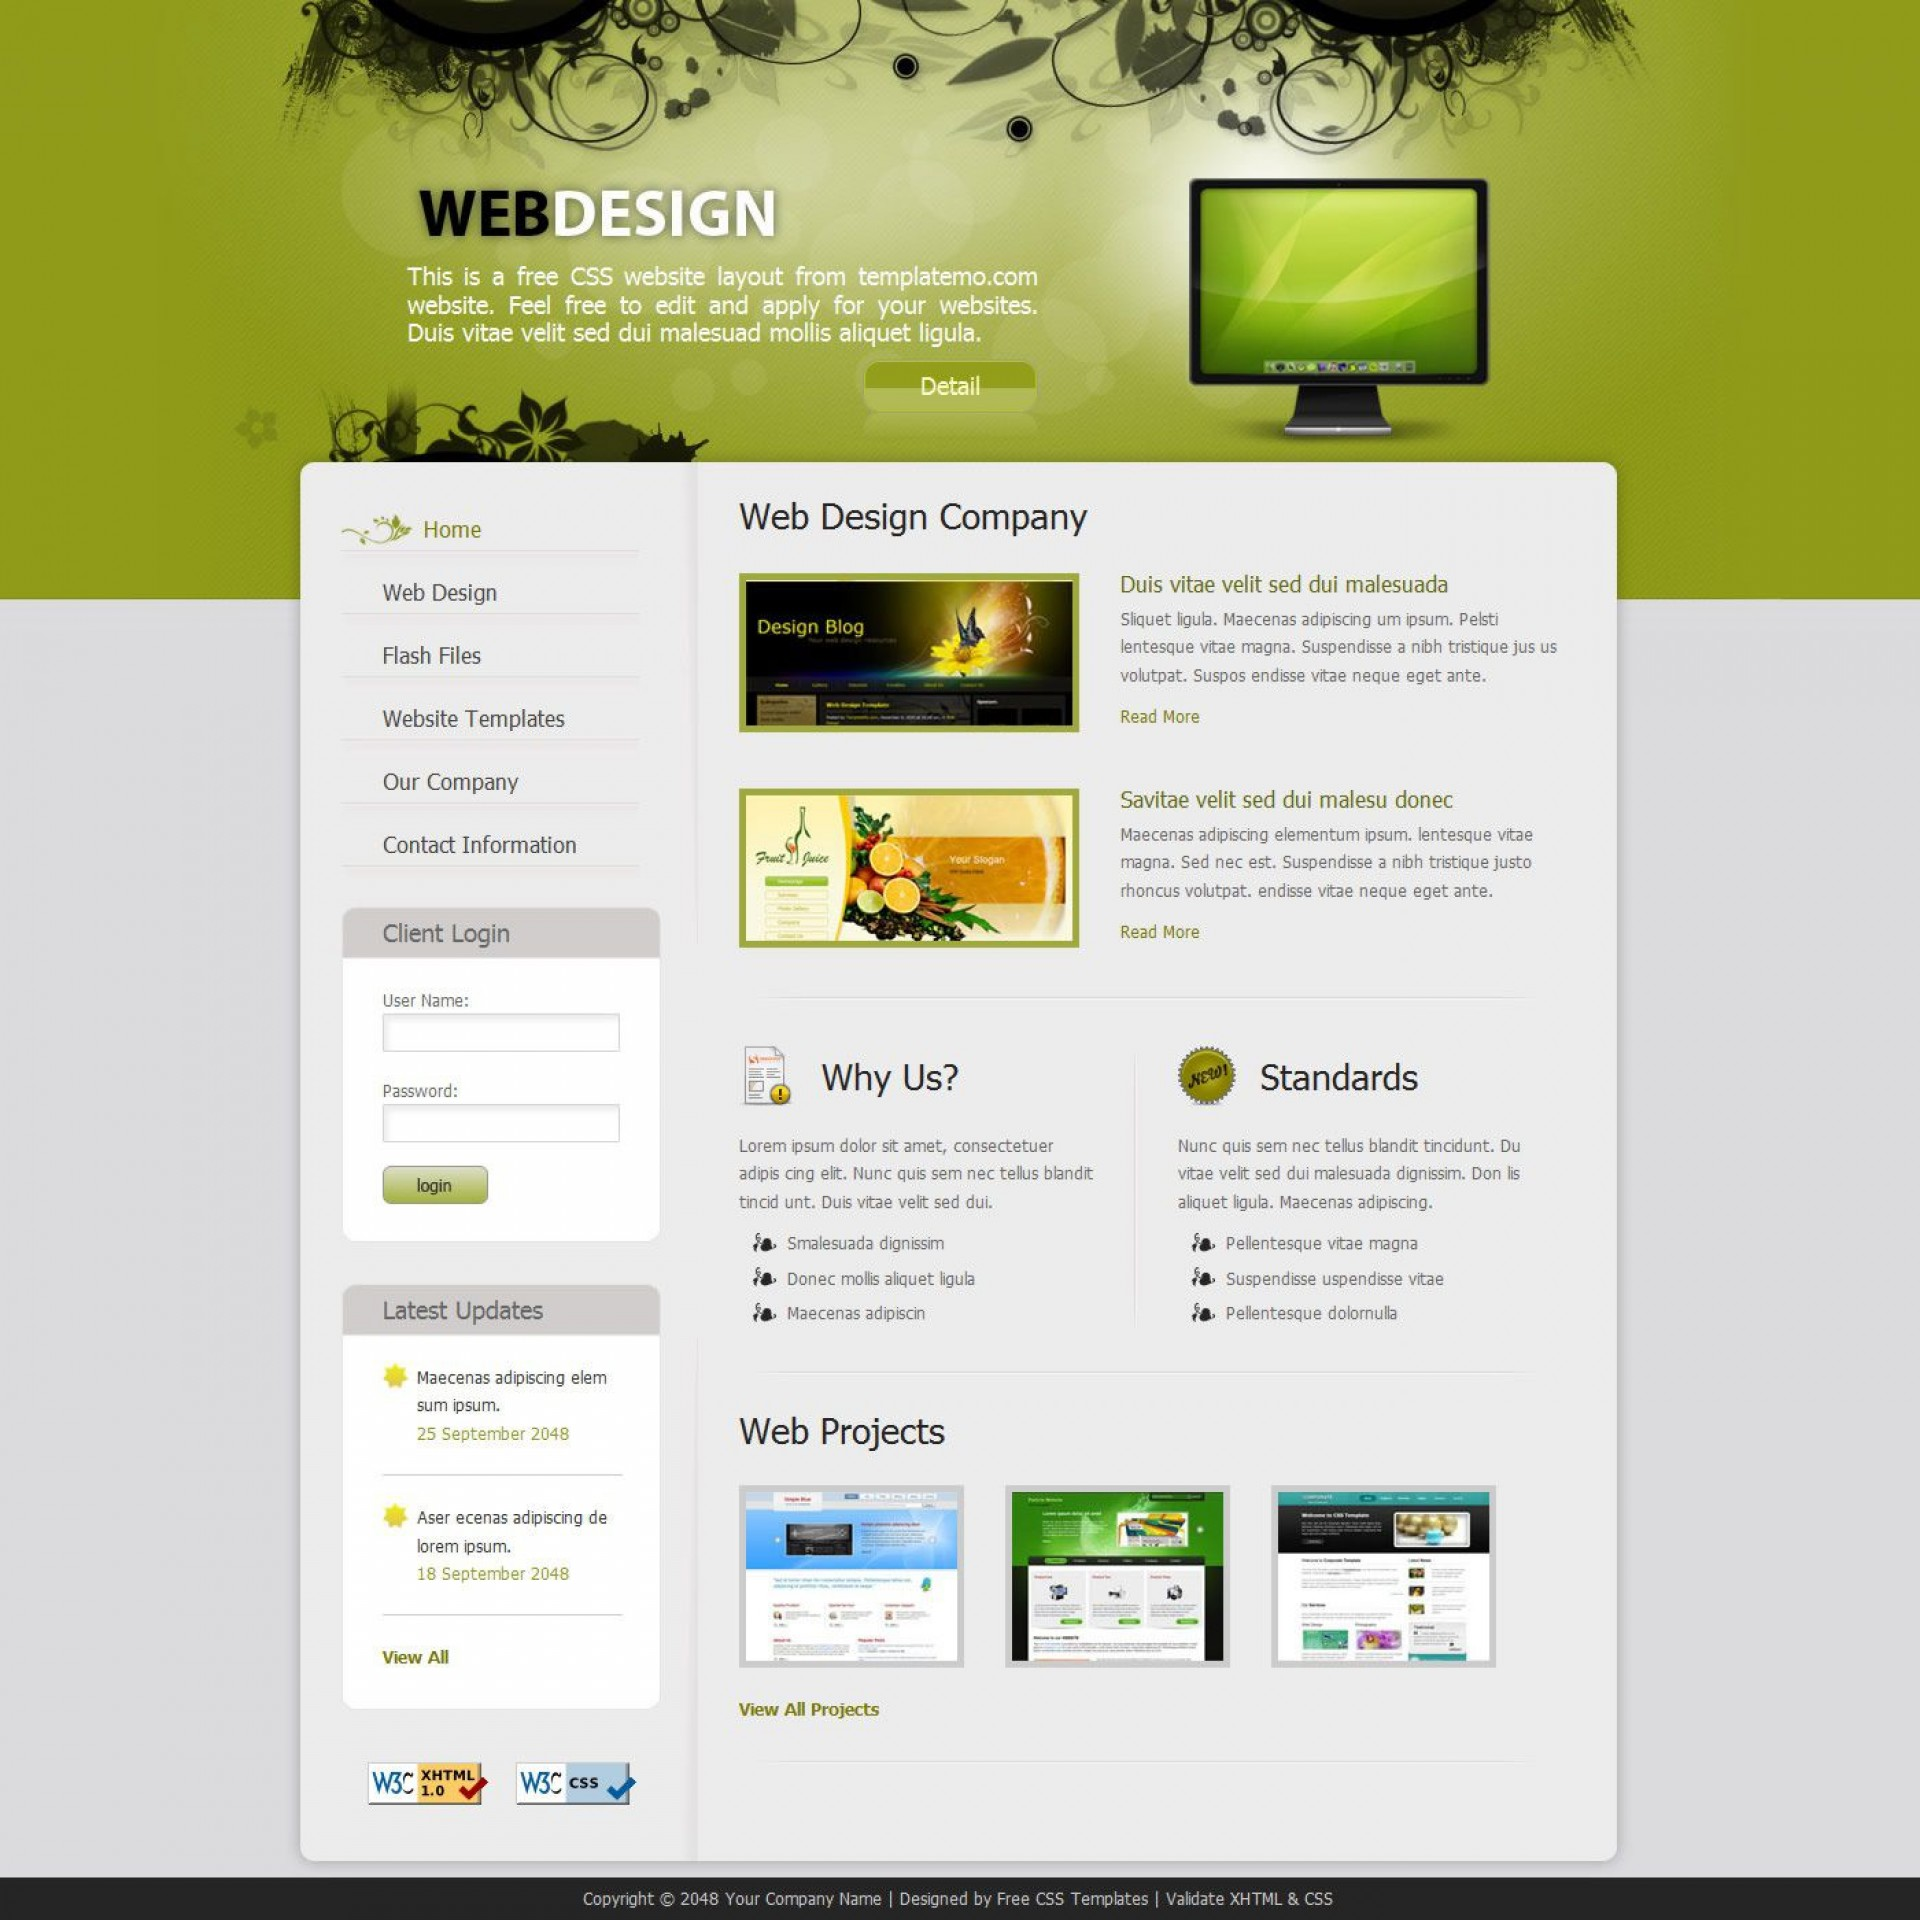 007 Wonderful Website Design Template Free Picture  Asp.net Web Download Psd1920